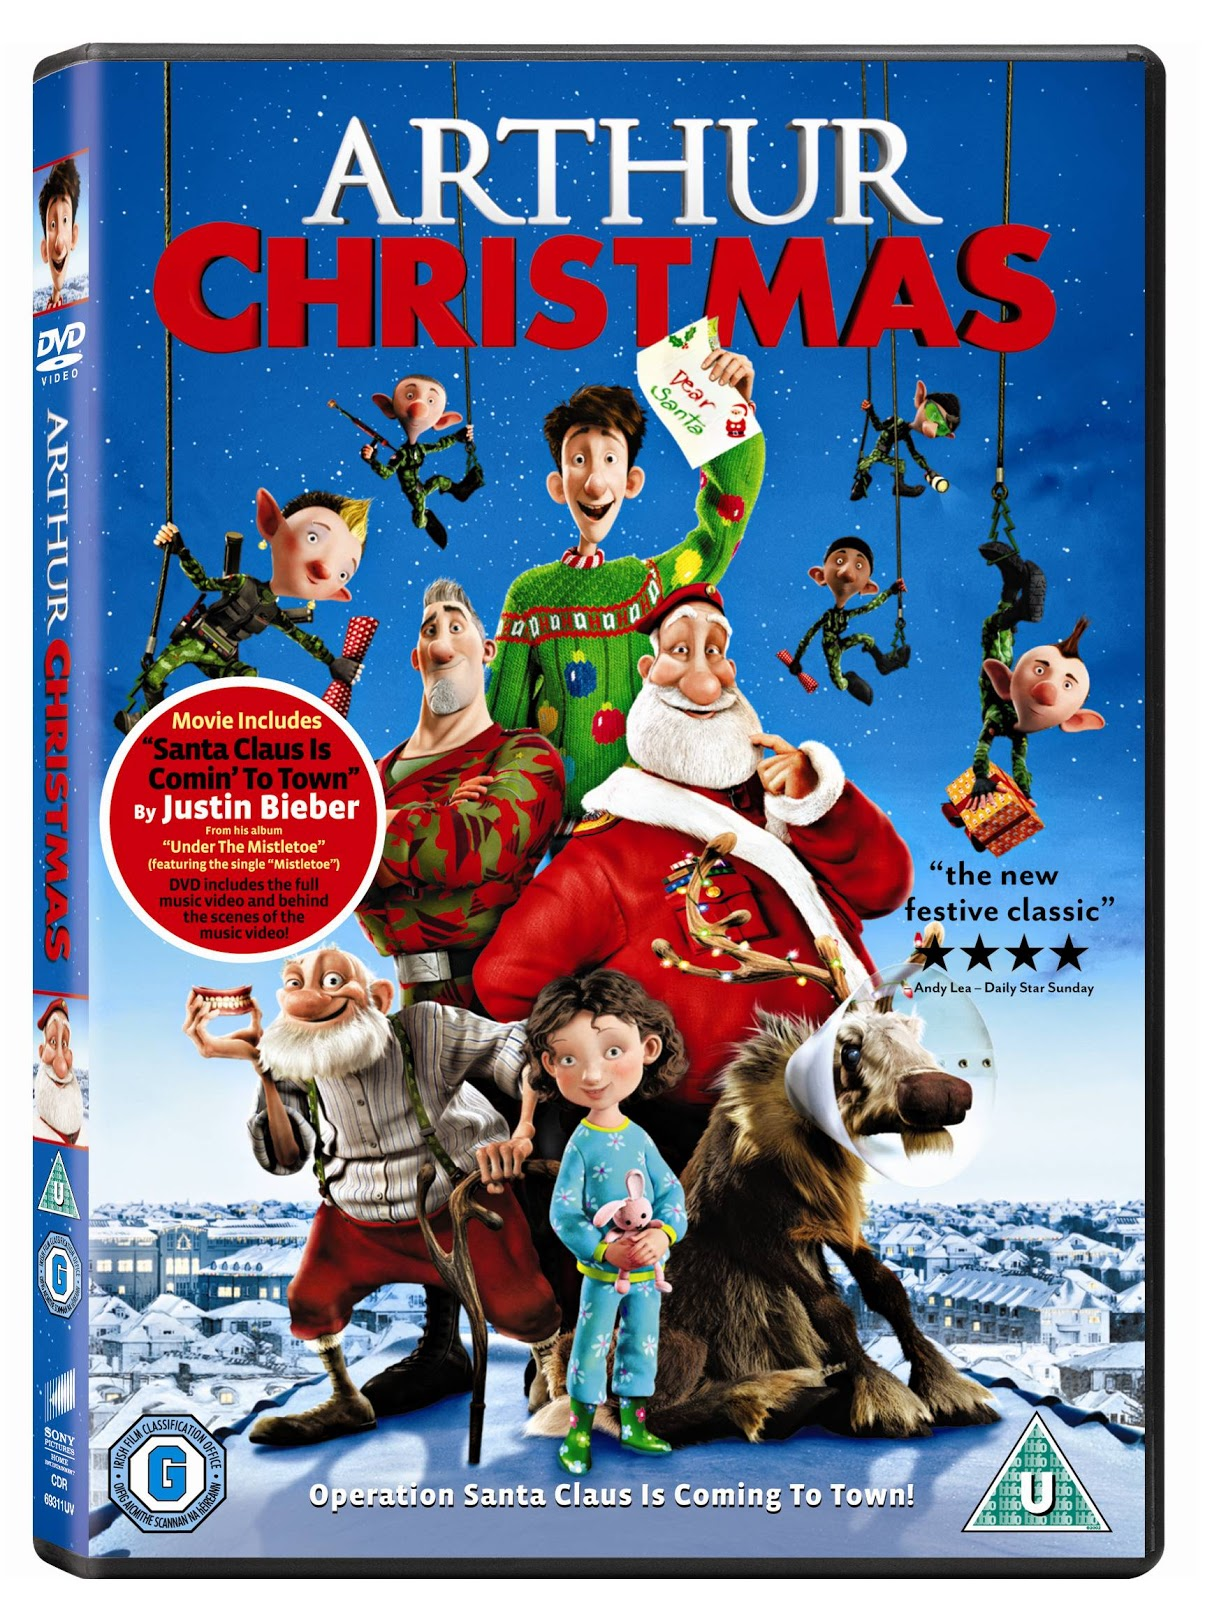 Arthur Christmas Elves.Older Single Mum Arthur Christmas